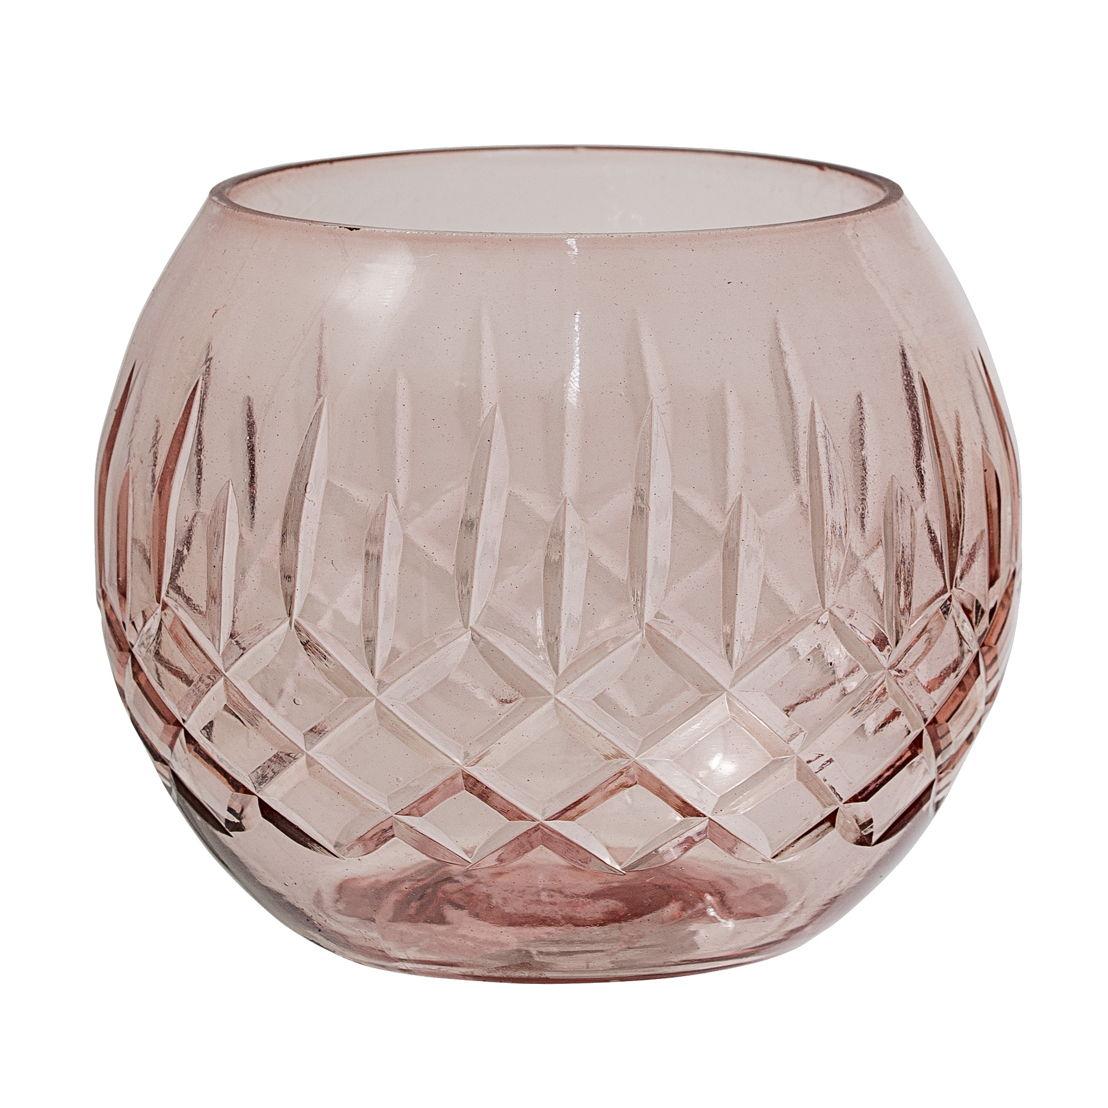 Bloomingville Waxinelichthouder glas, rosé - €11